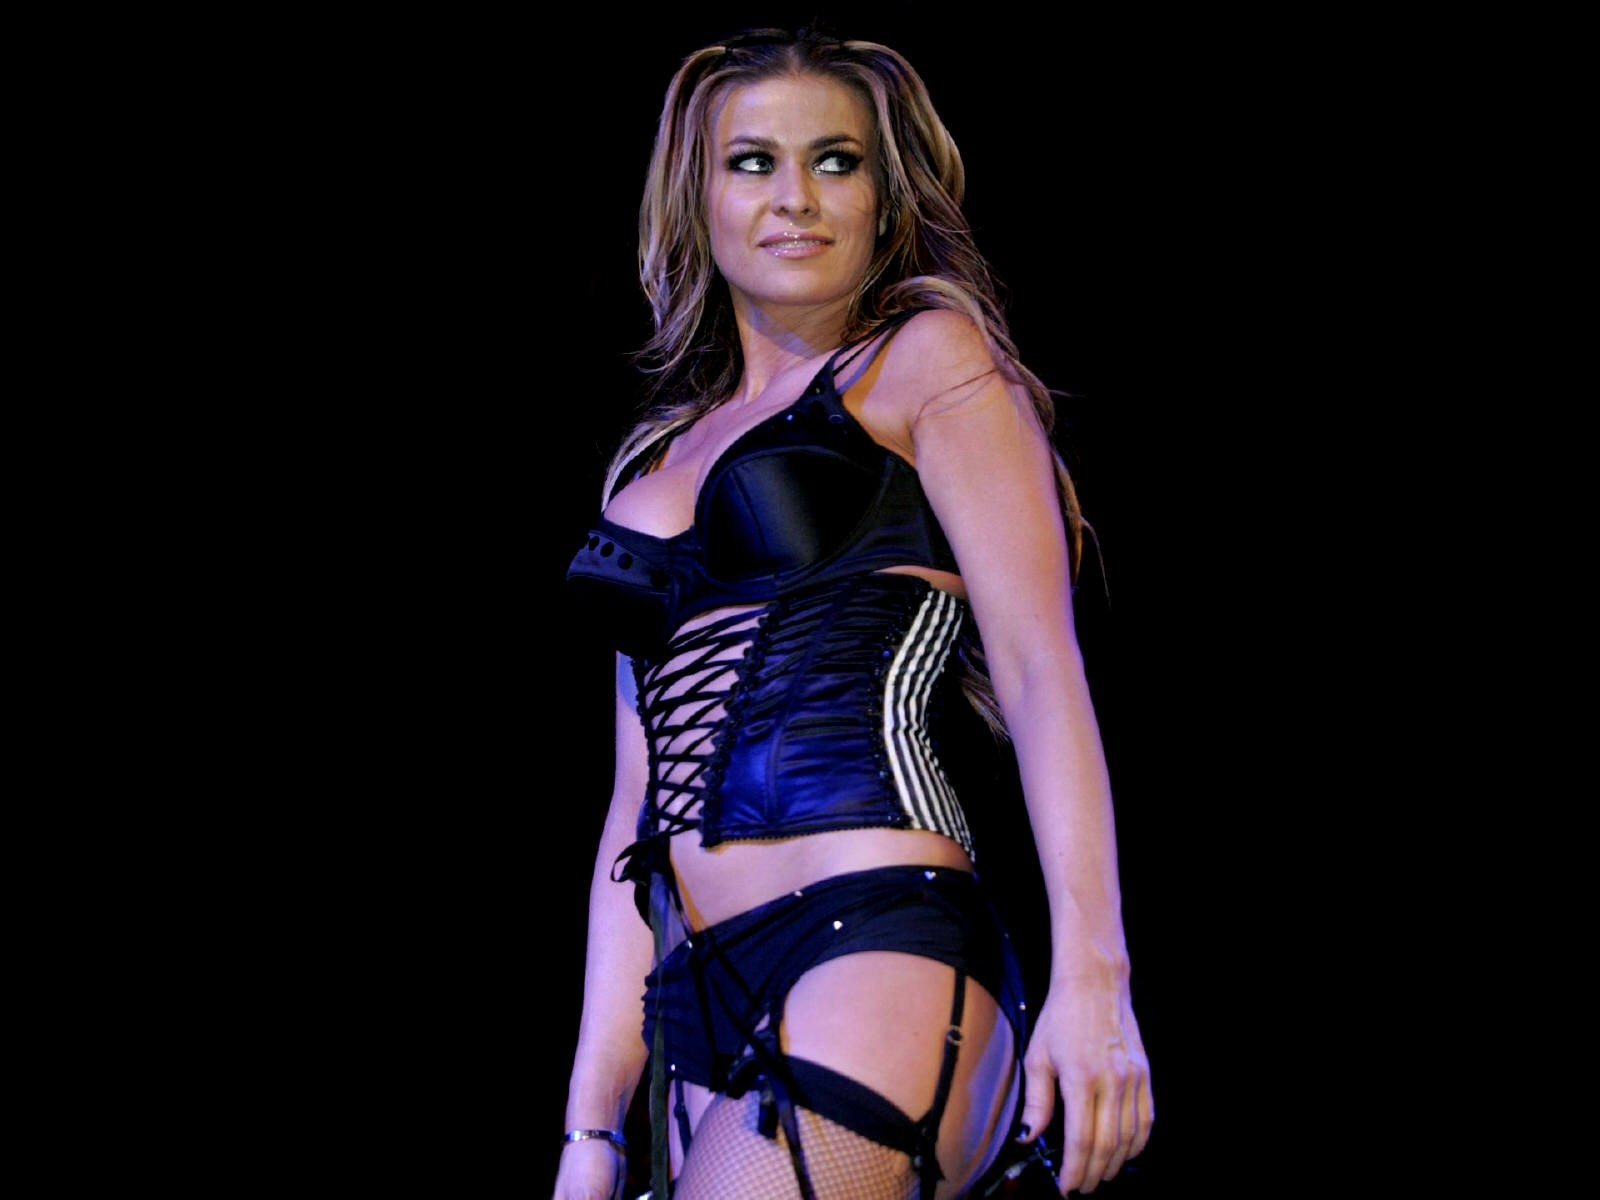 Wallpaper di Carmen Electra in lingerie nera